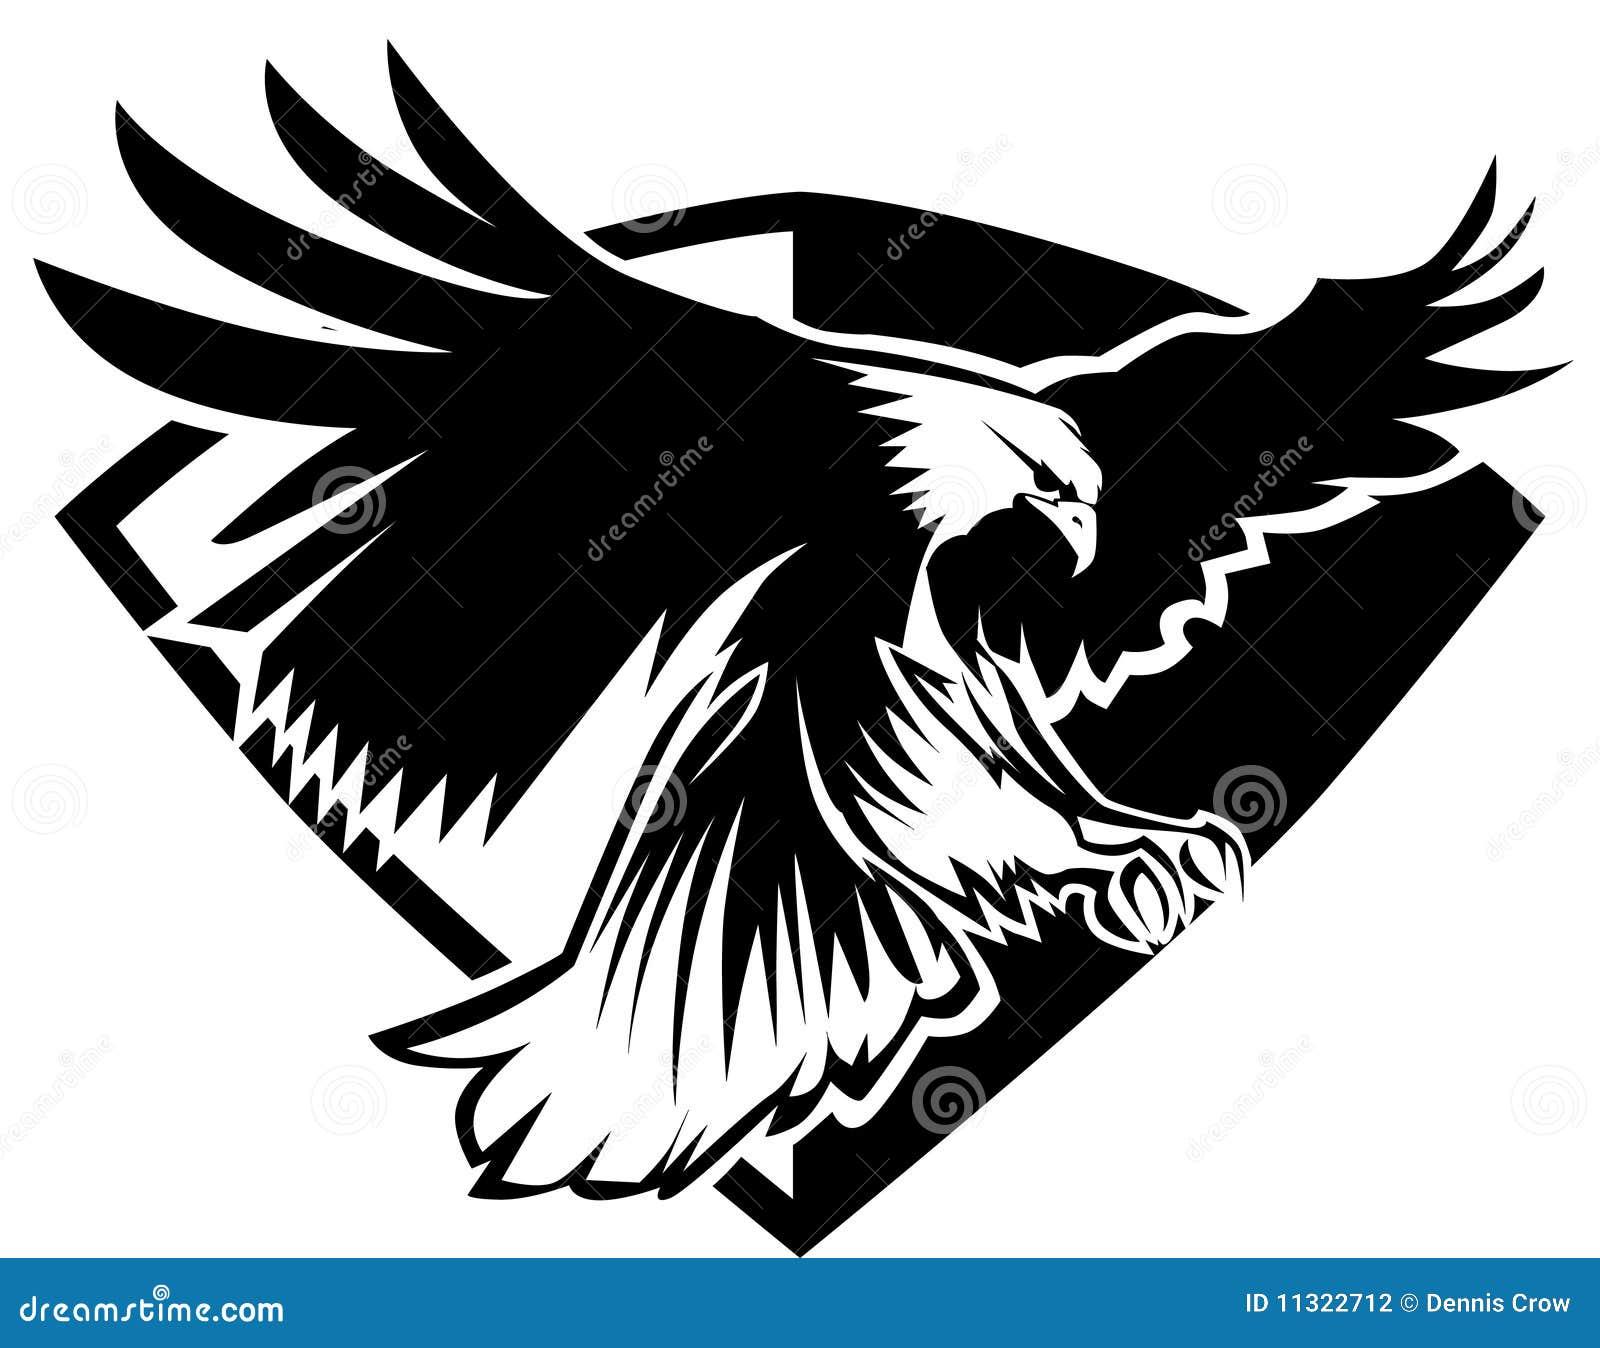 Eagle Dxf Black 108